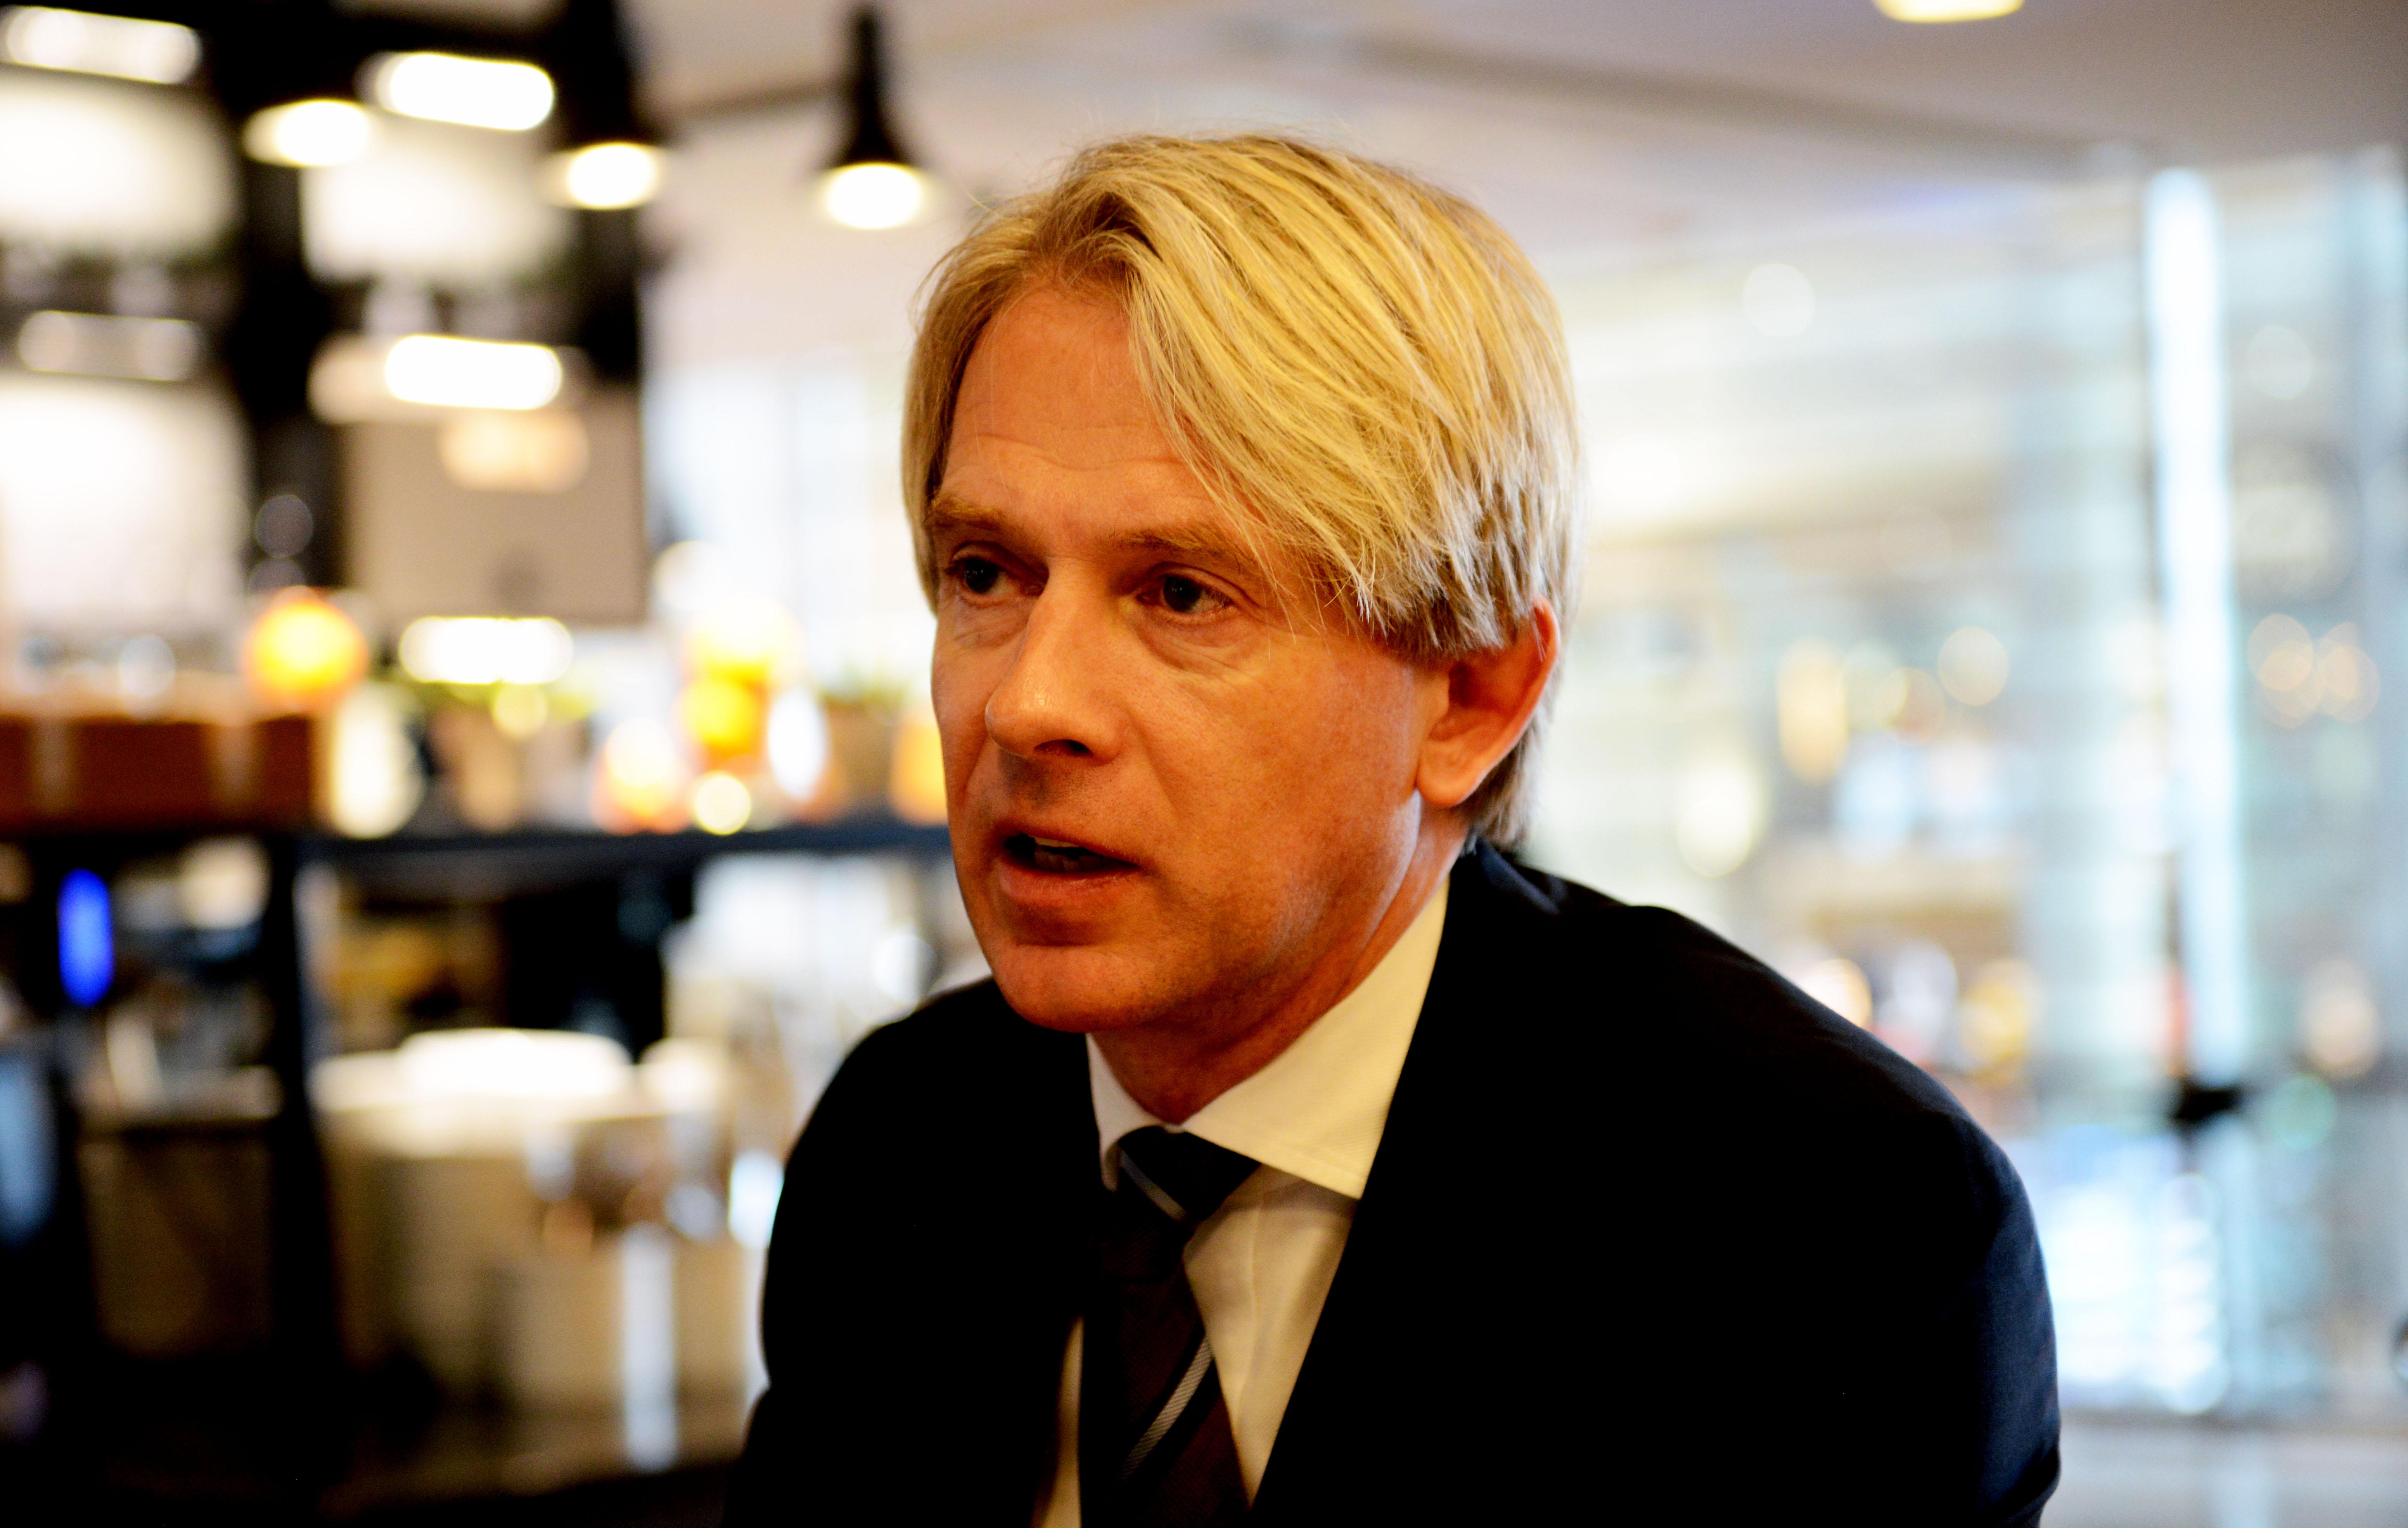 Koncerndirektør i SAS, Eivind Roald. (Foto: Joakim J. Hvistendahl)